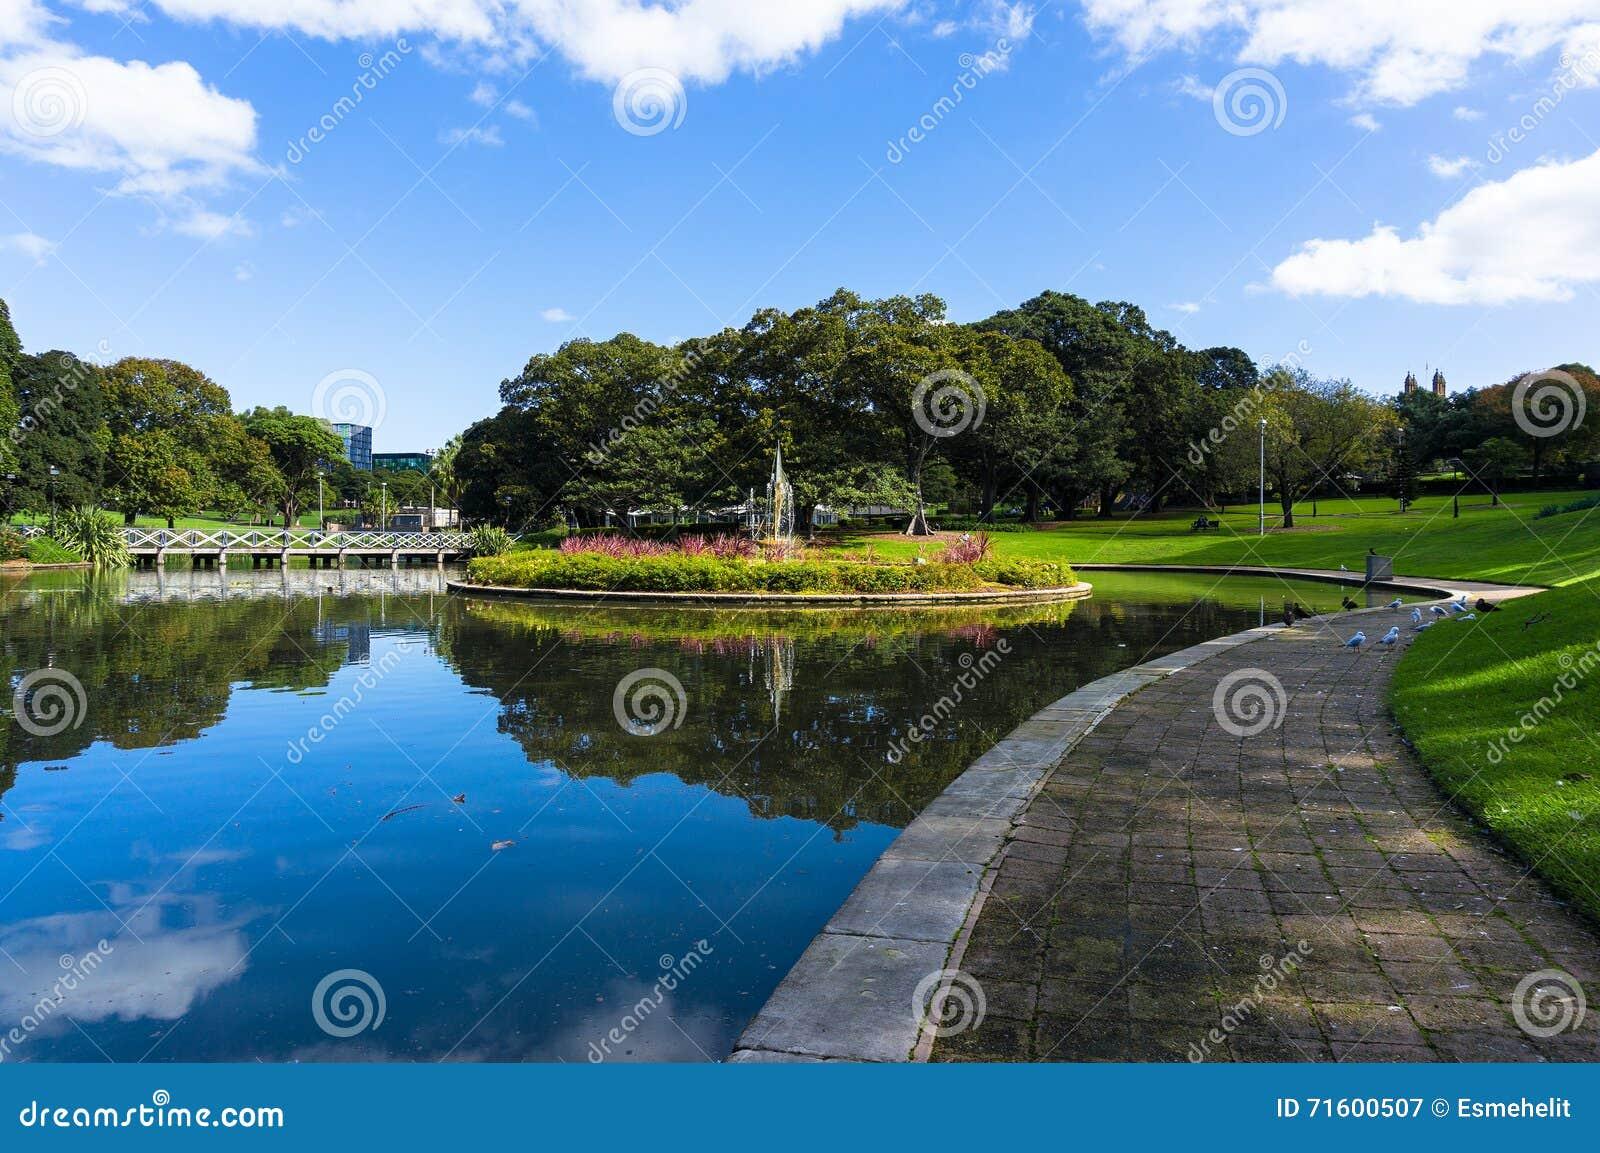 City pond and fountain, Sydney University park